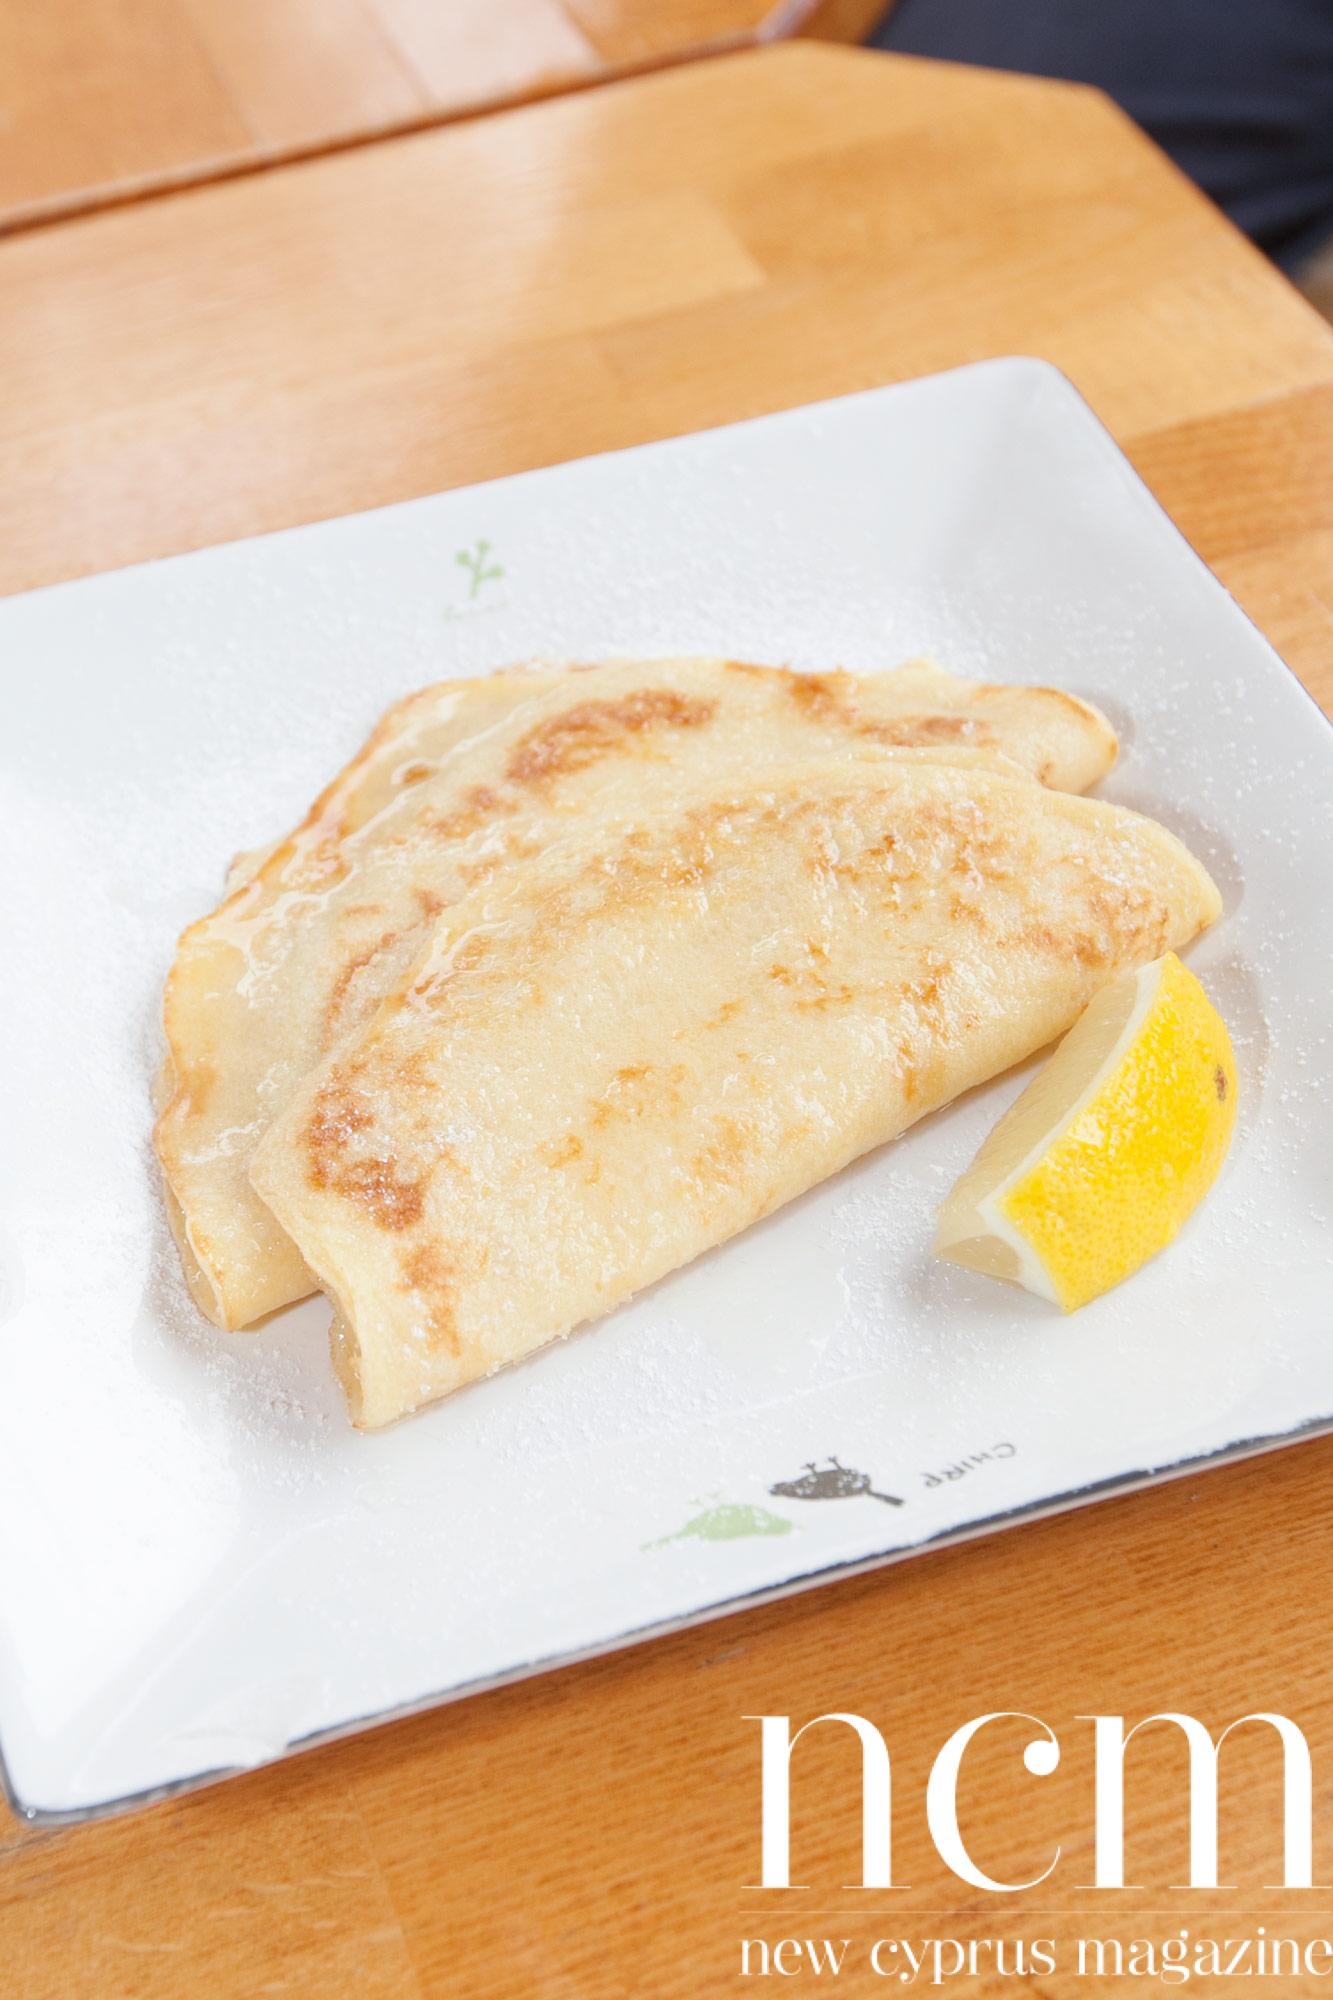 Pancakes with lemon at Food Lodge North Cyprus